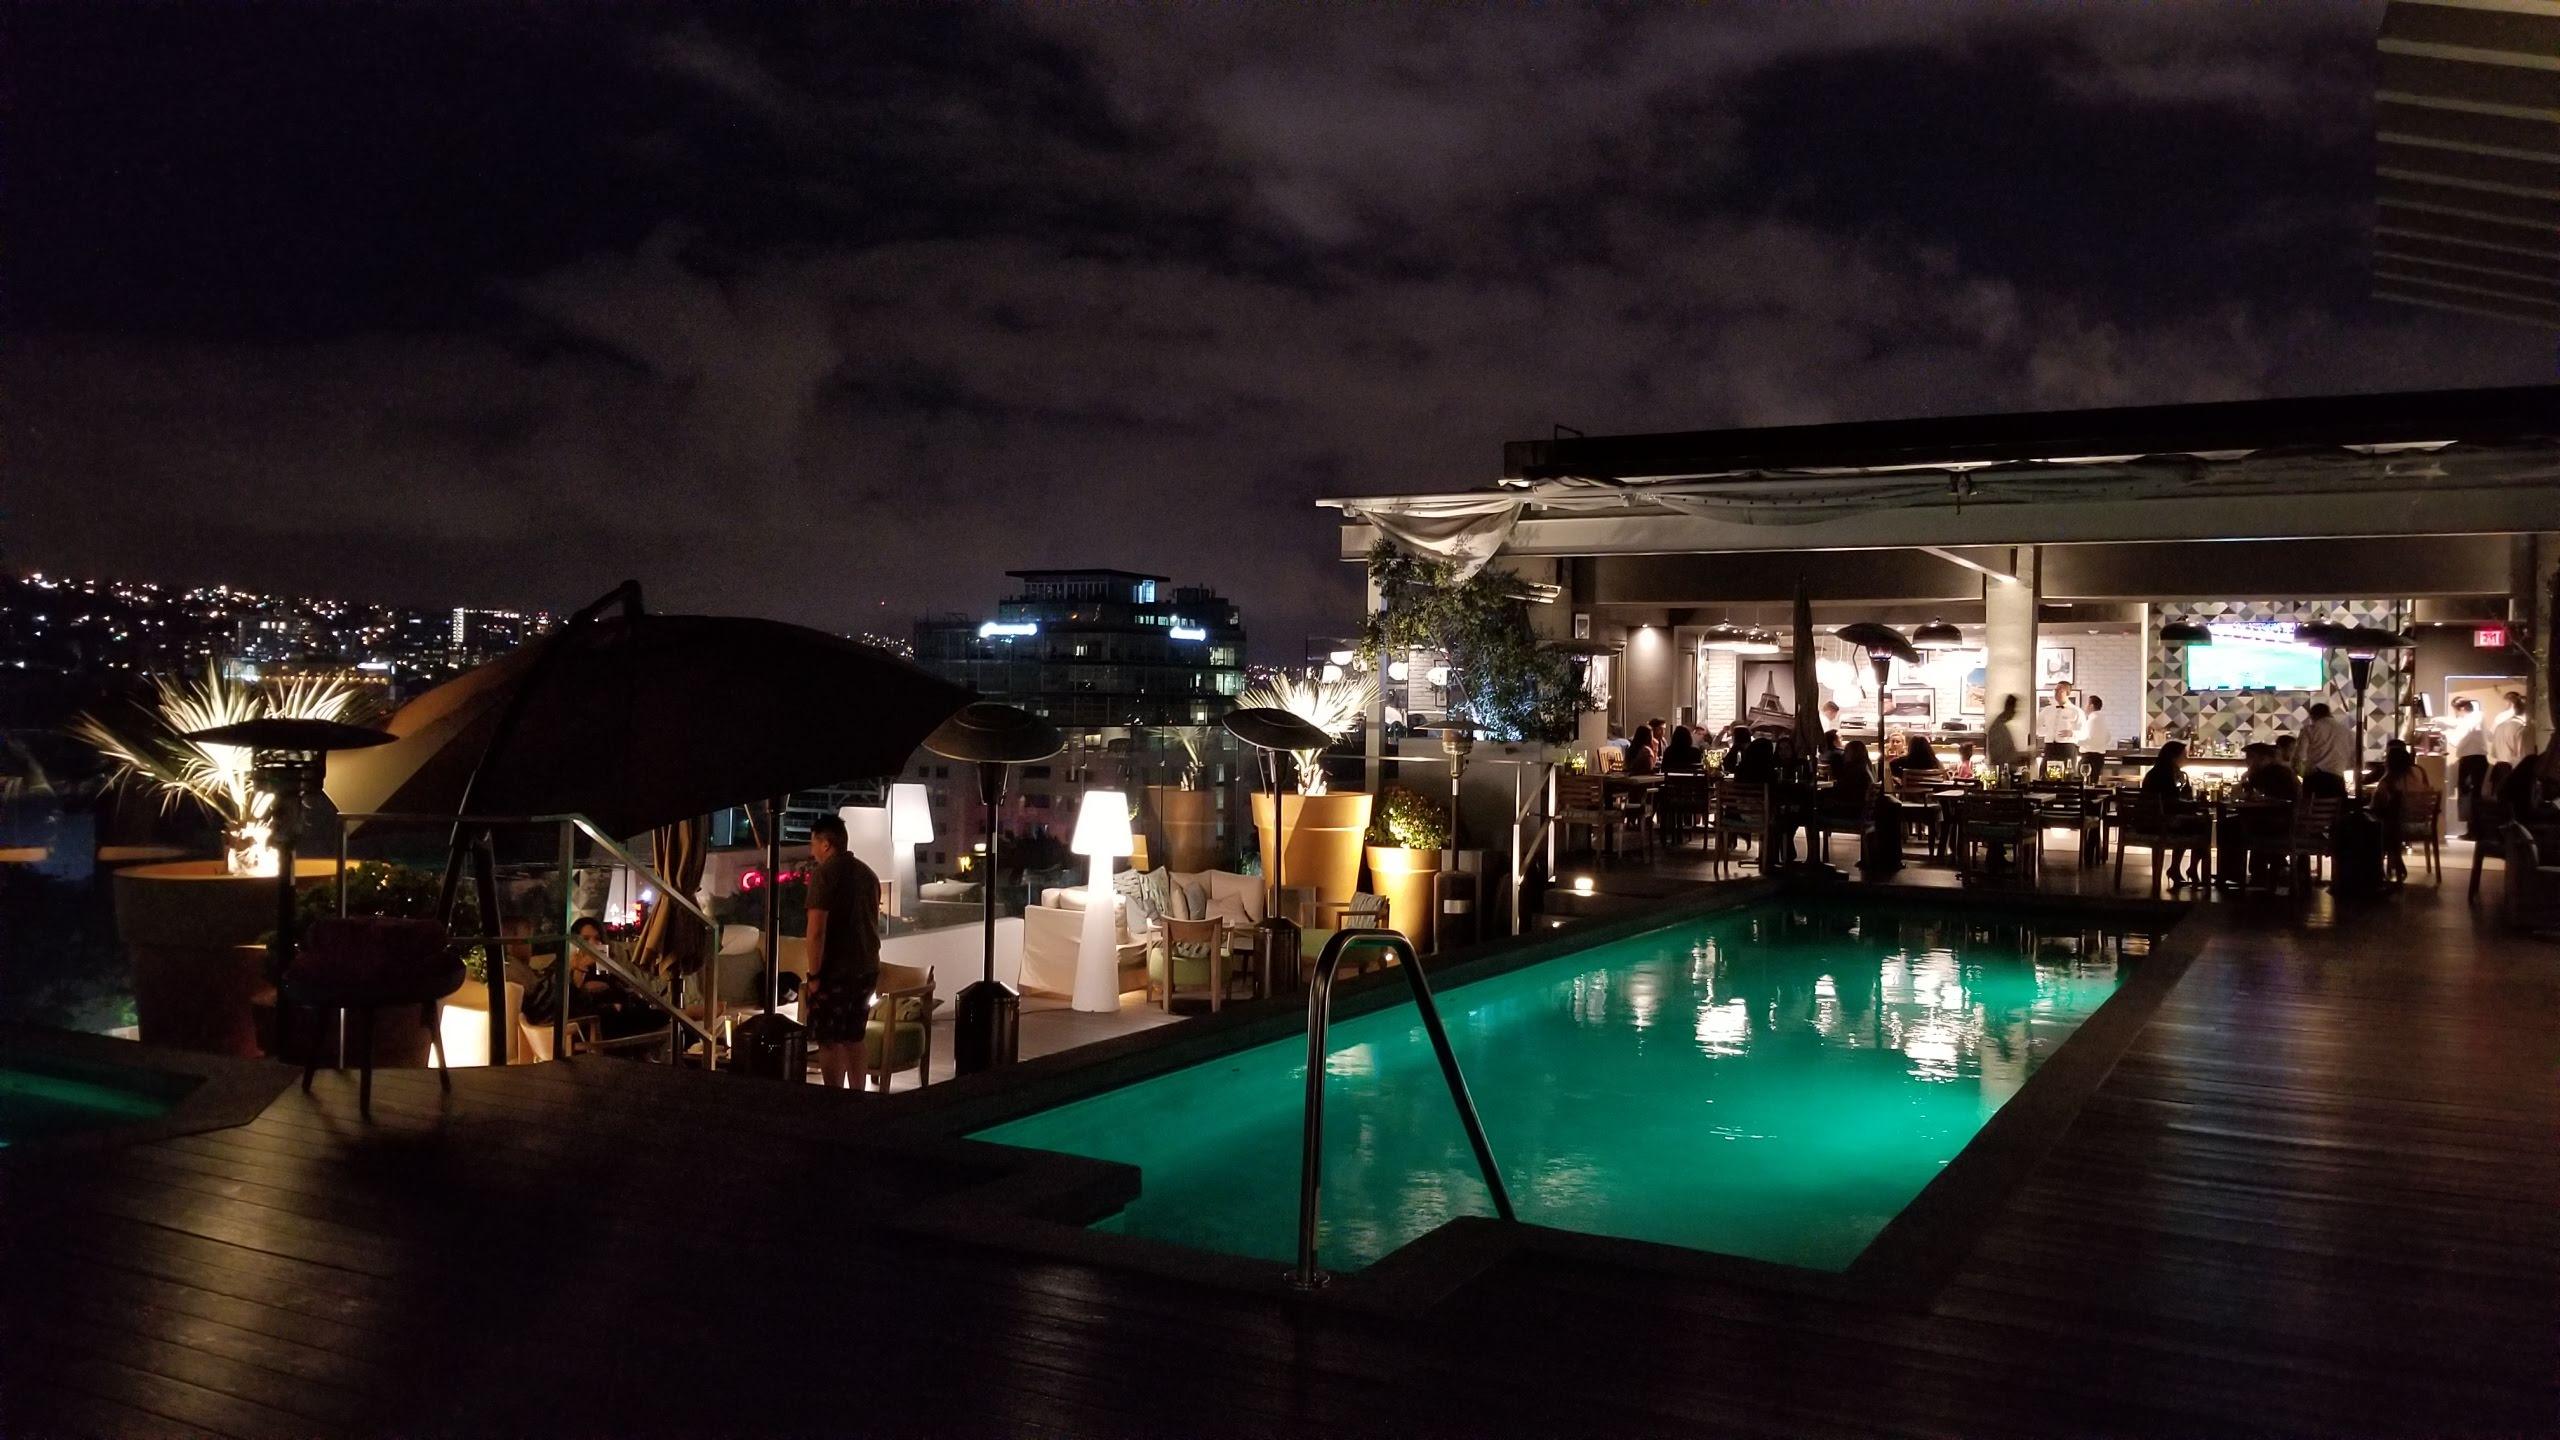 Rooftop pool and Sushi en la Azotea at night